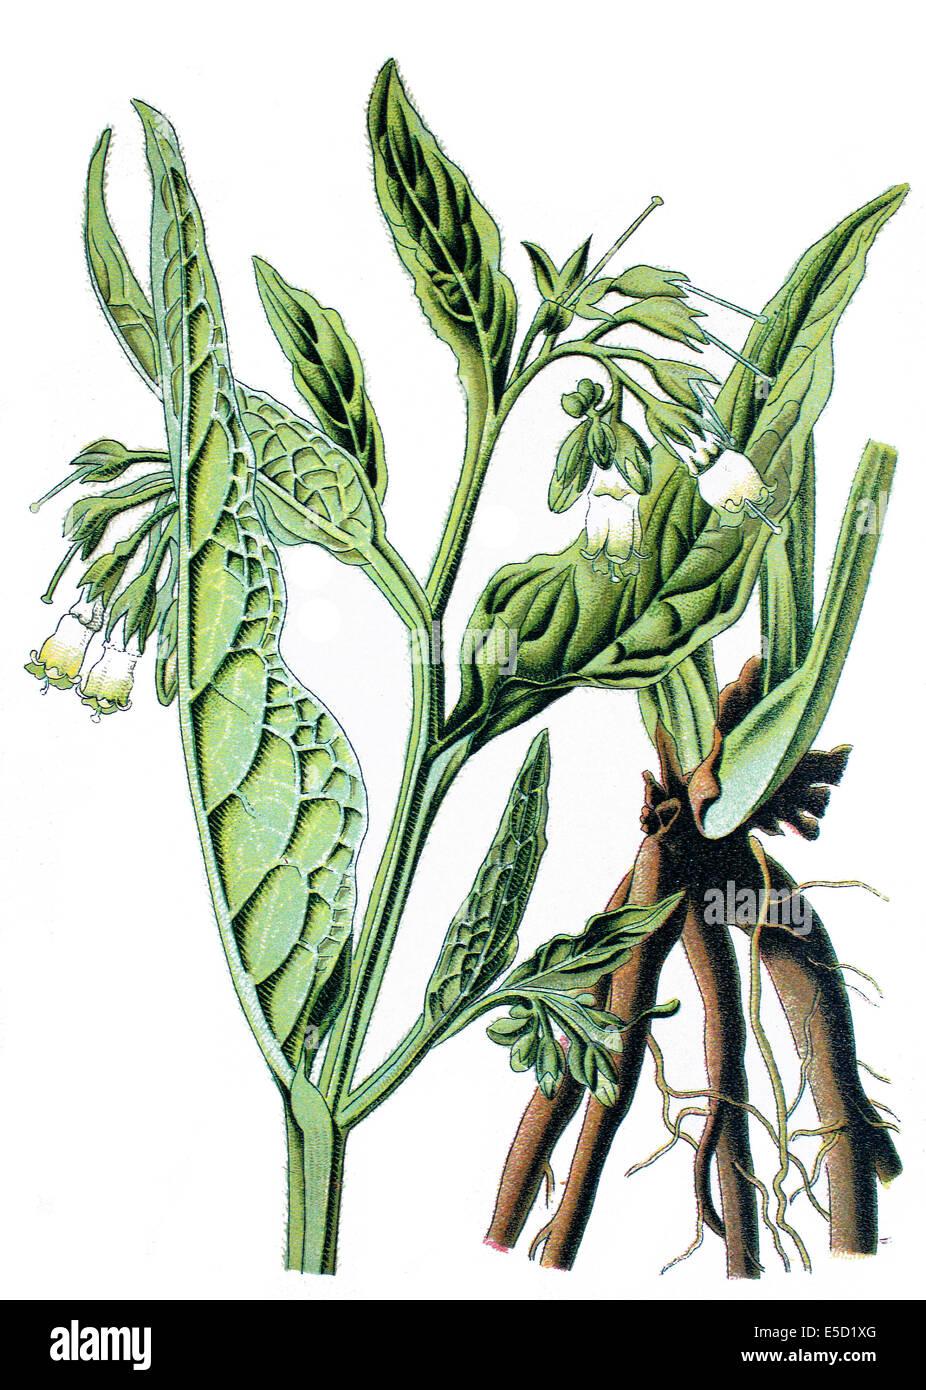 common comfrey or true comfrey, Quaker comfrey, cultivated comfrey, boneset, knitbone, consound, and slippery-root, - Stock Image